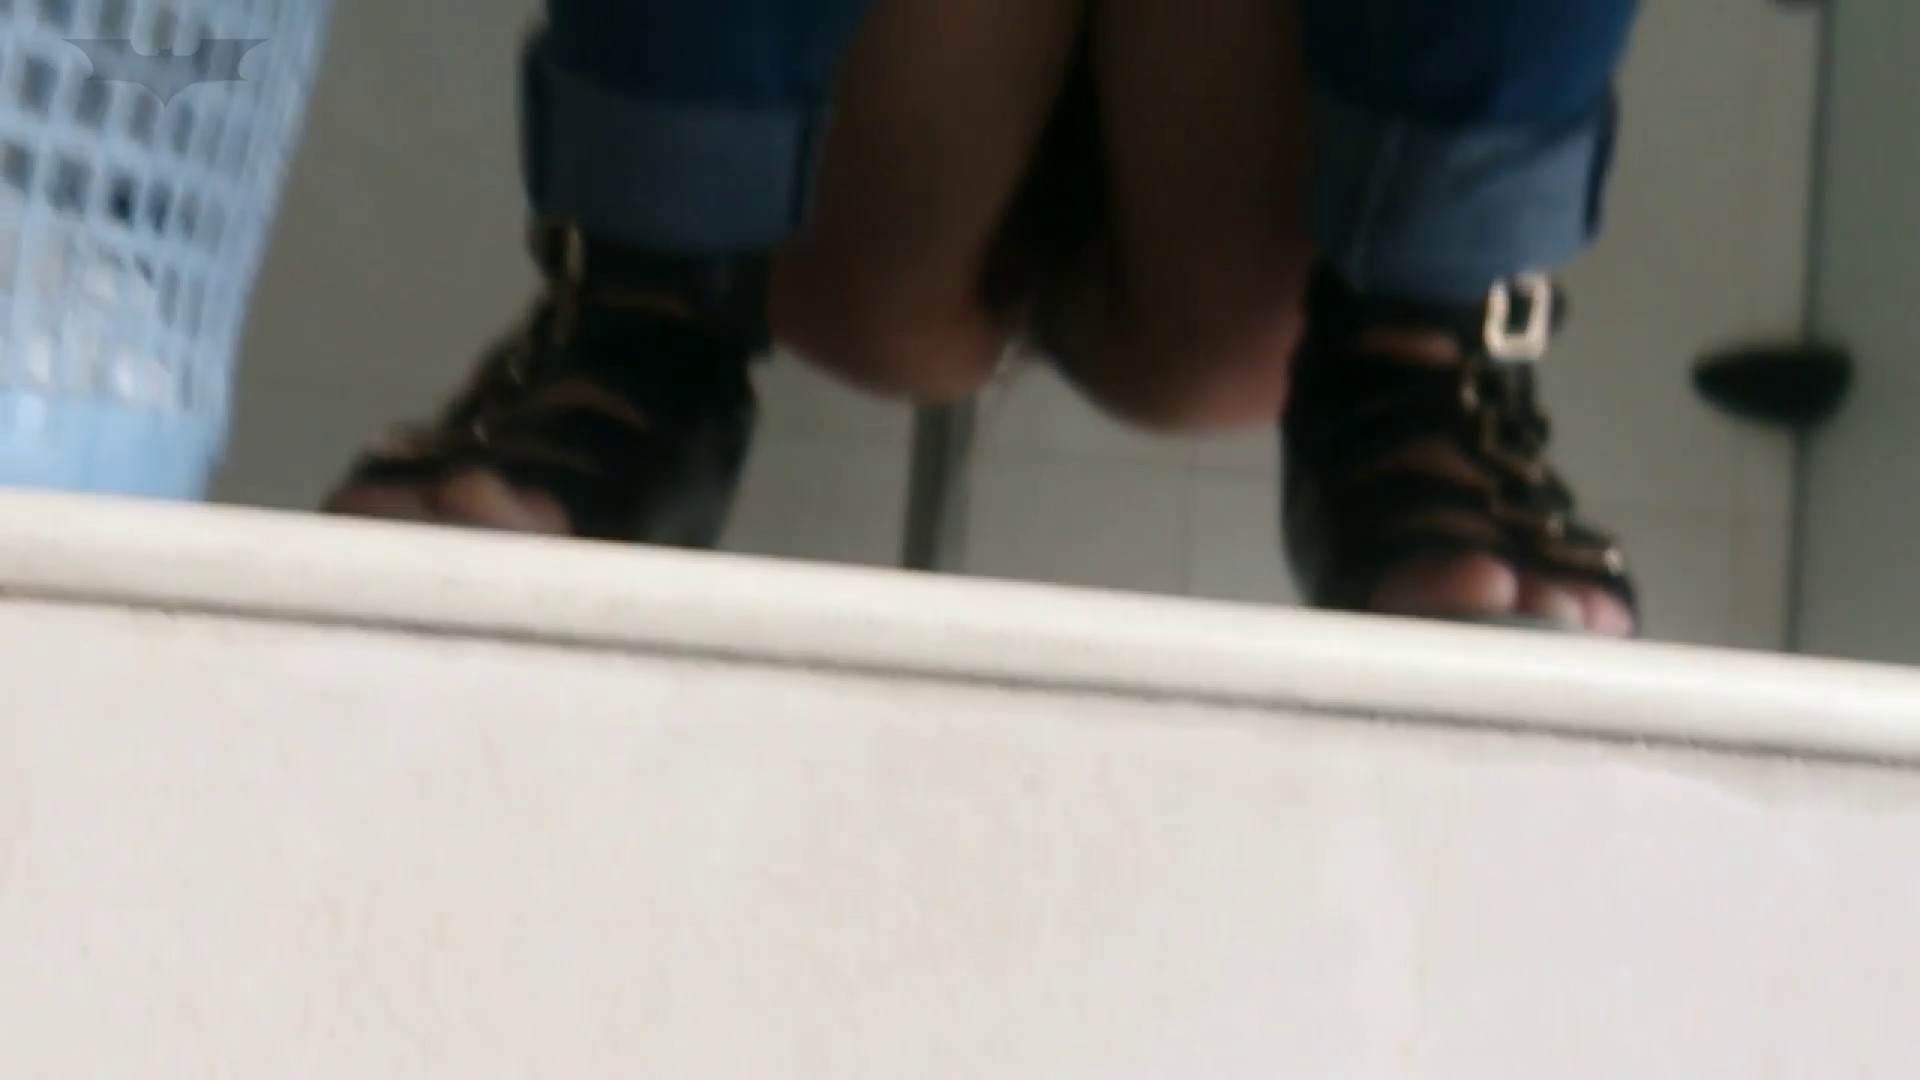 JD盗撮 美女の洗面所の秘密 Vol.37 美肌 ワレメ無修正動画無料 112枚 45